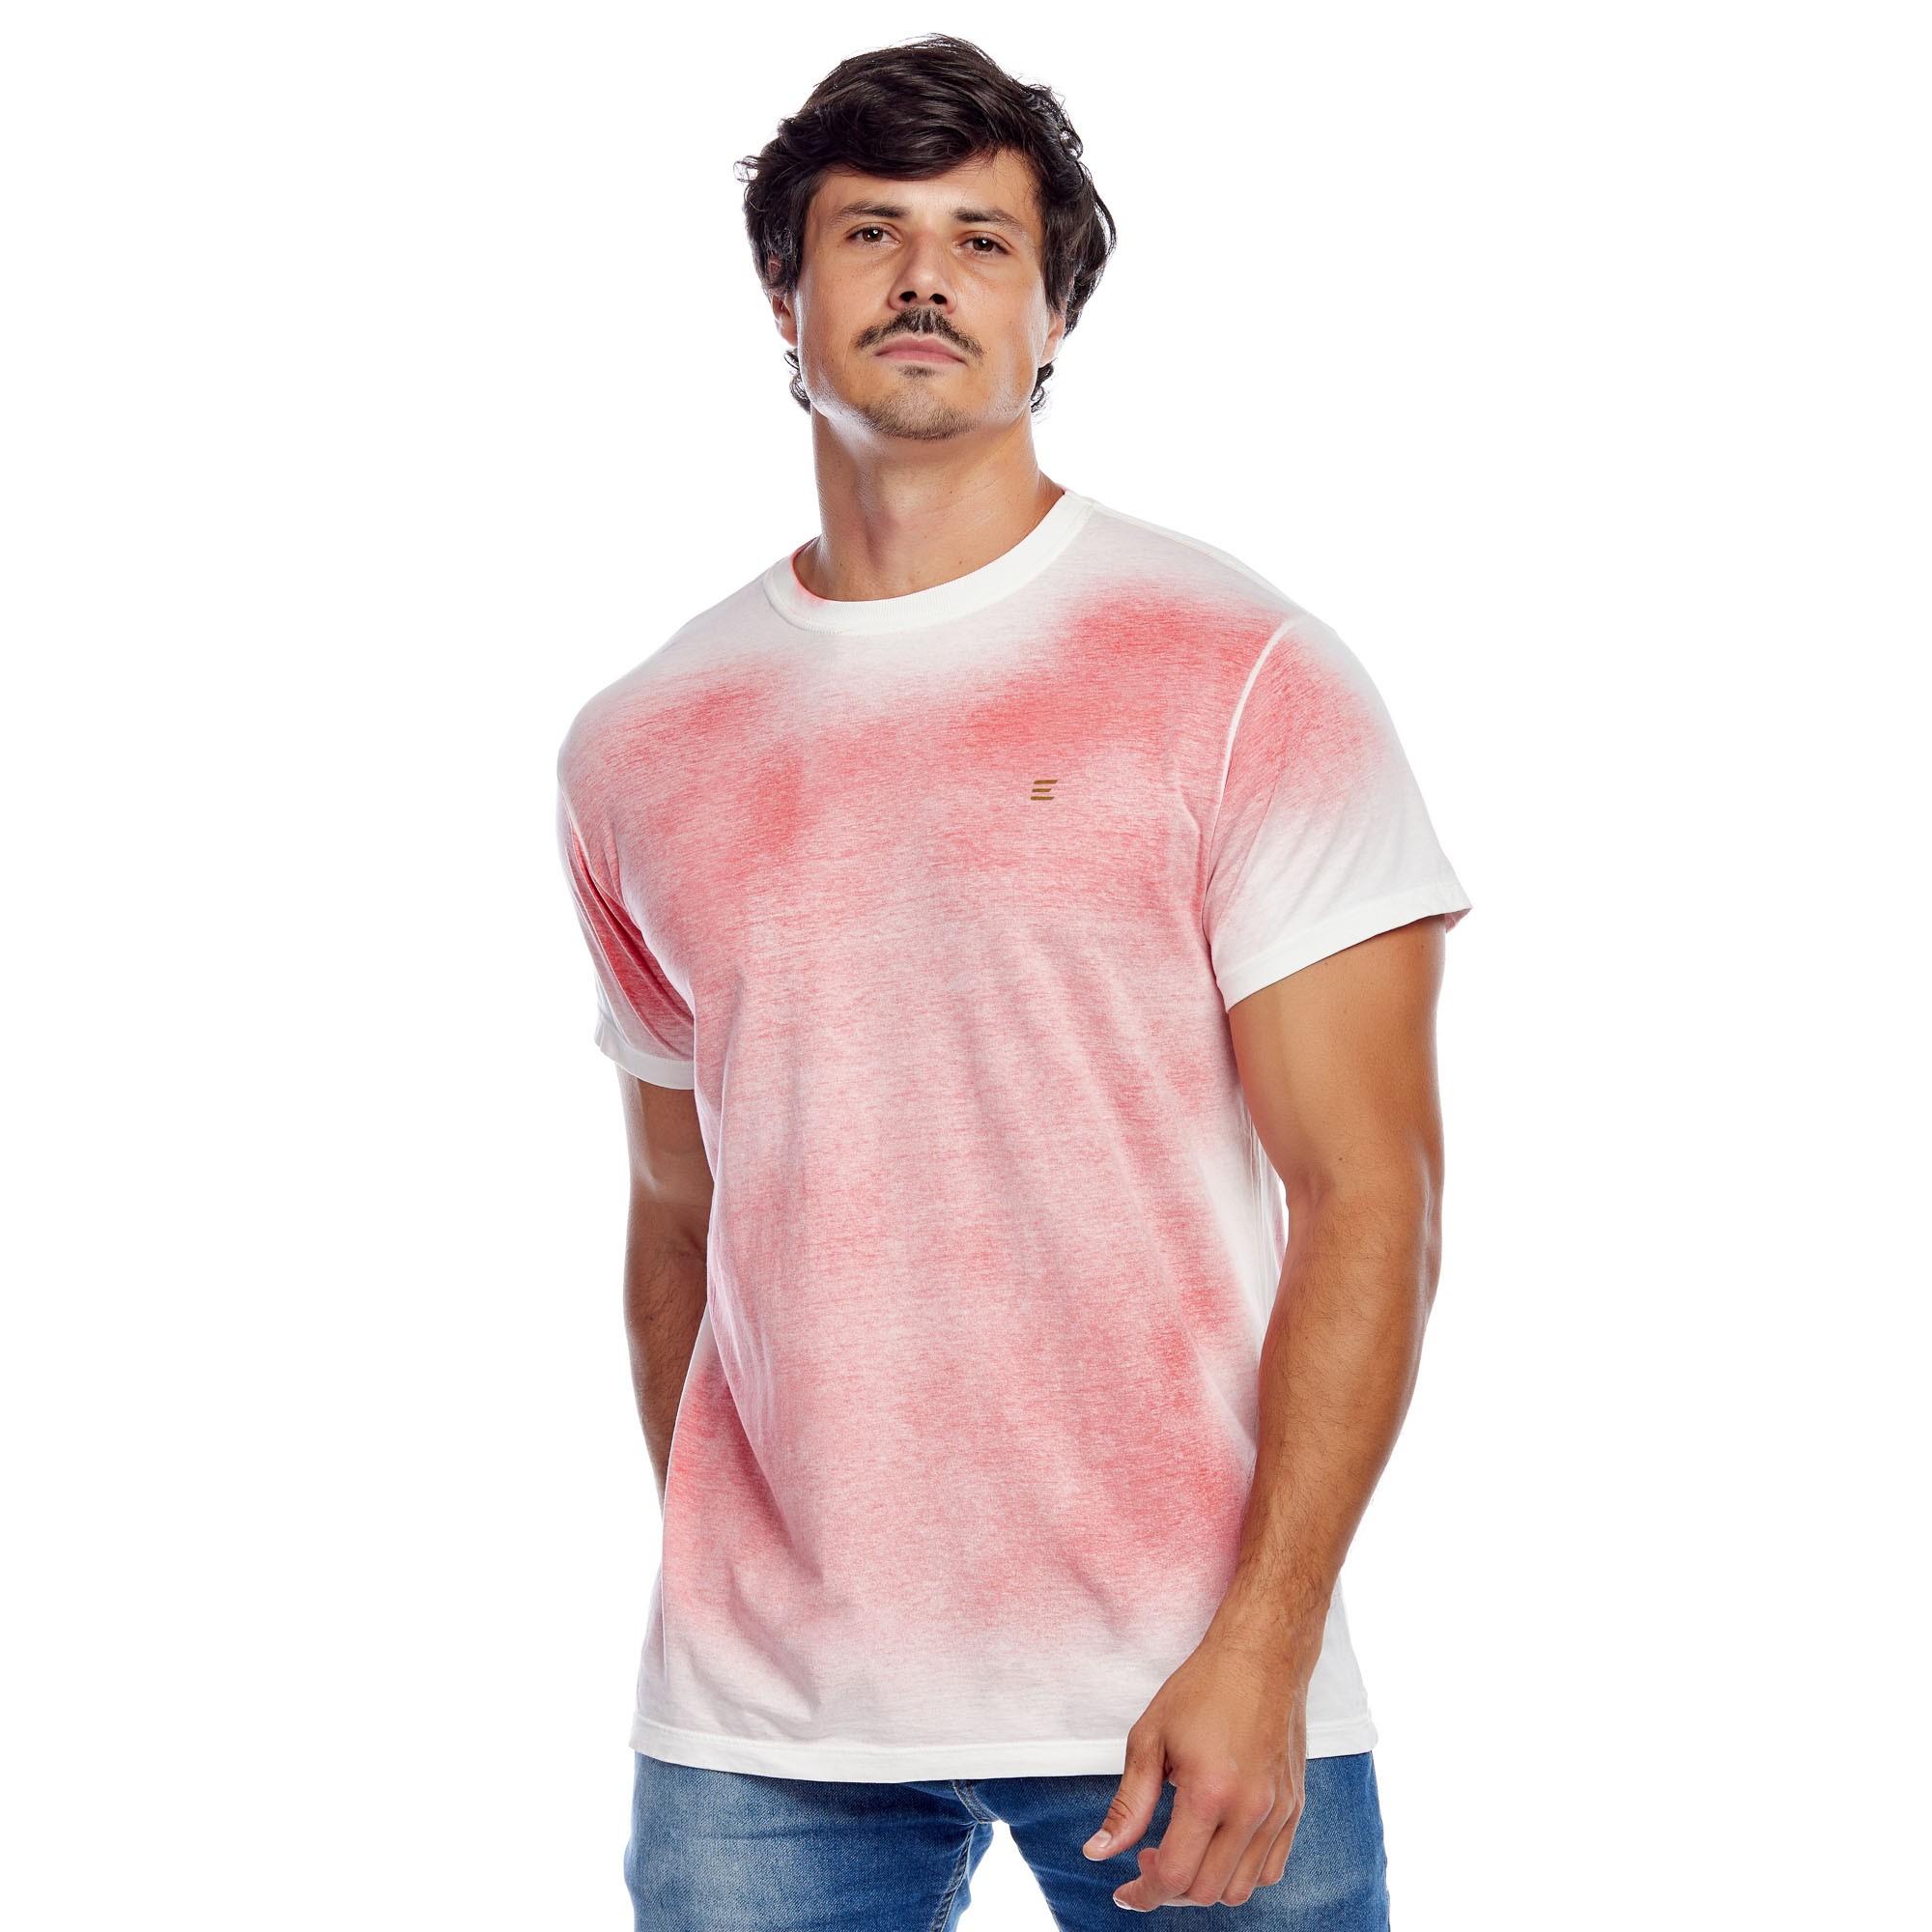 Camiseta Masculina Spray Interno Evolvee